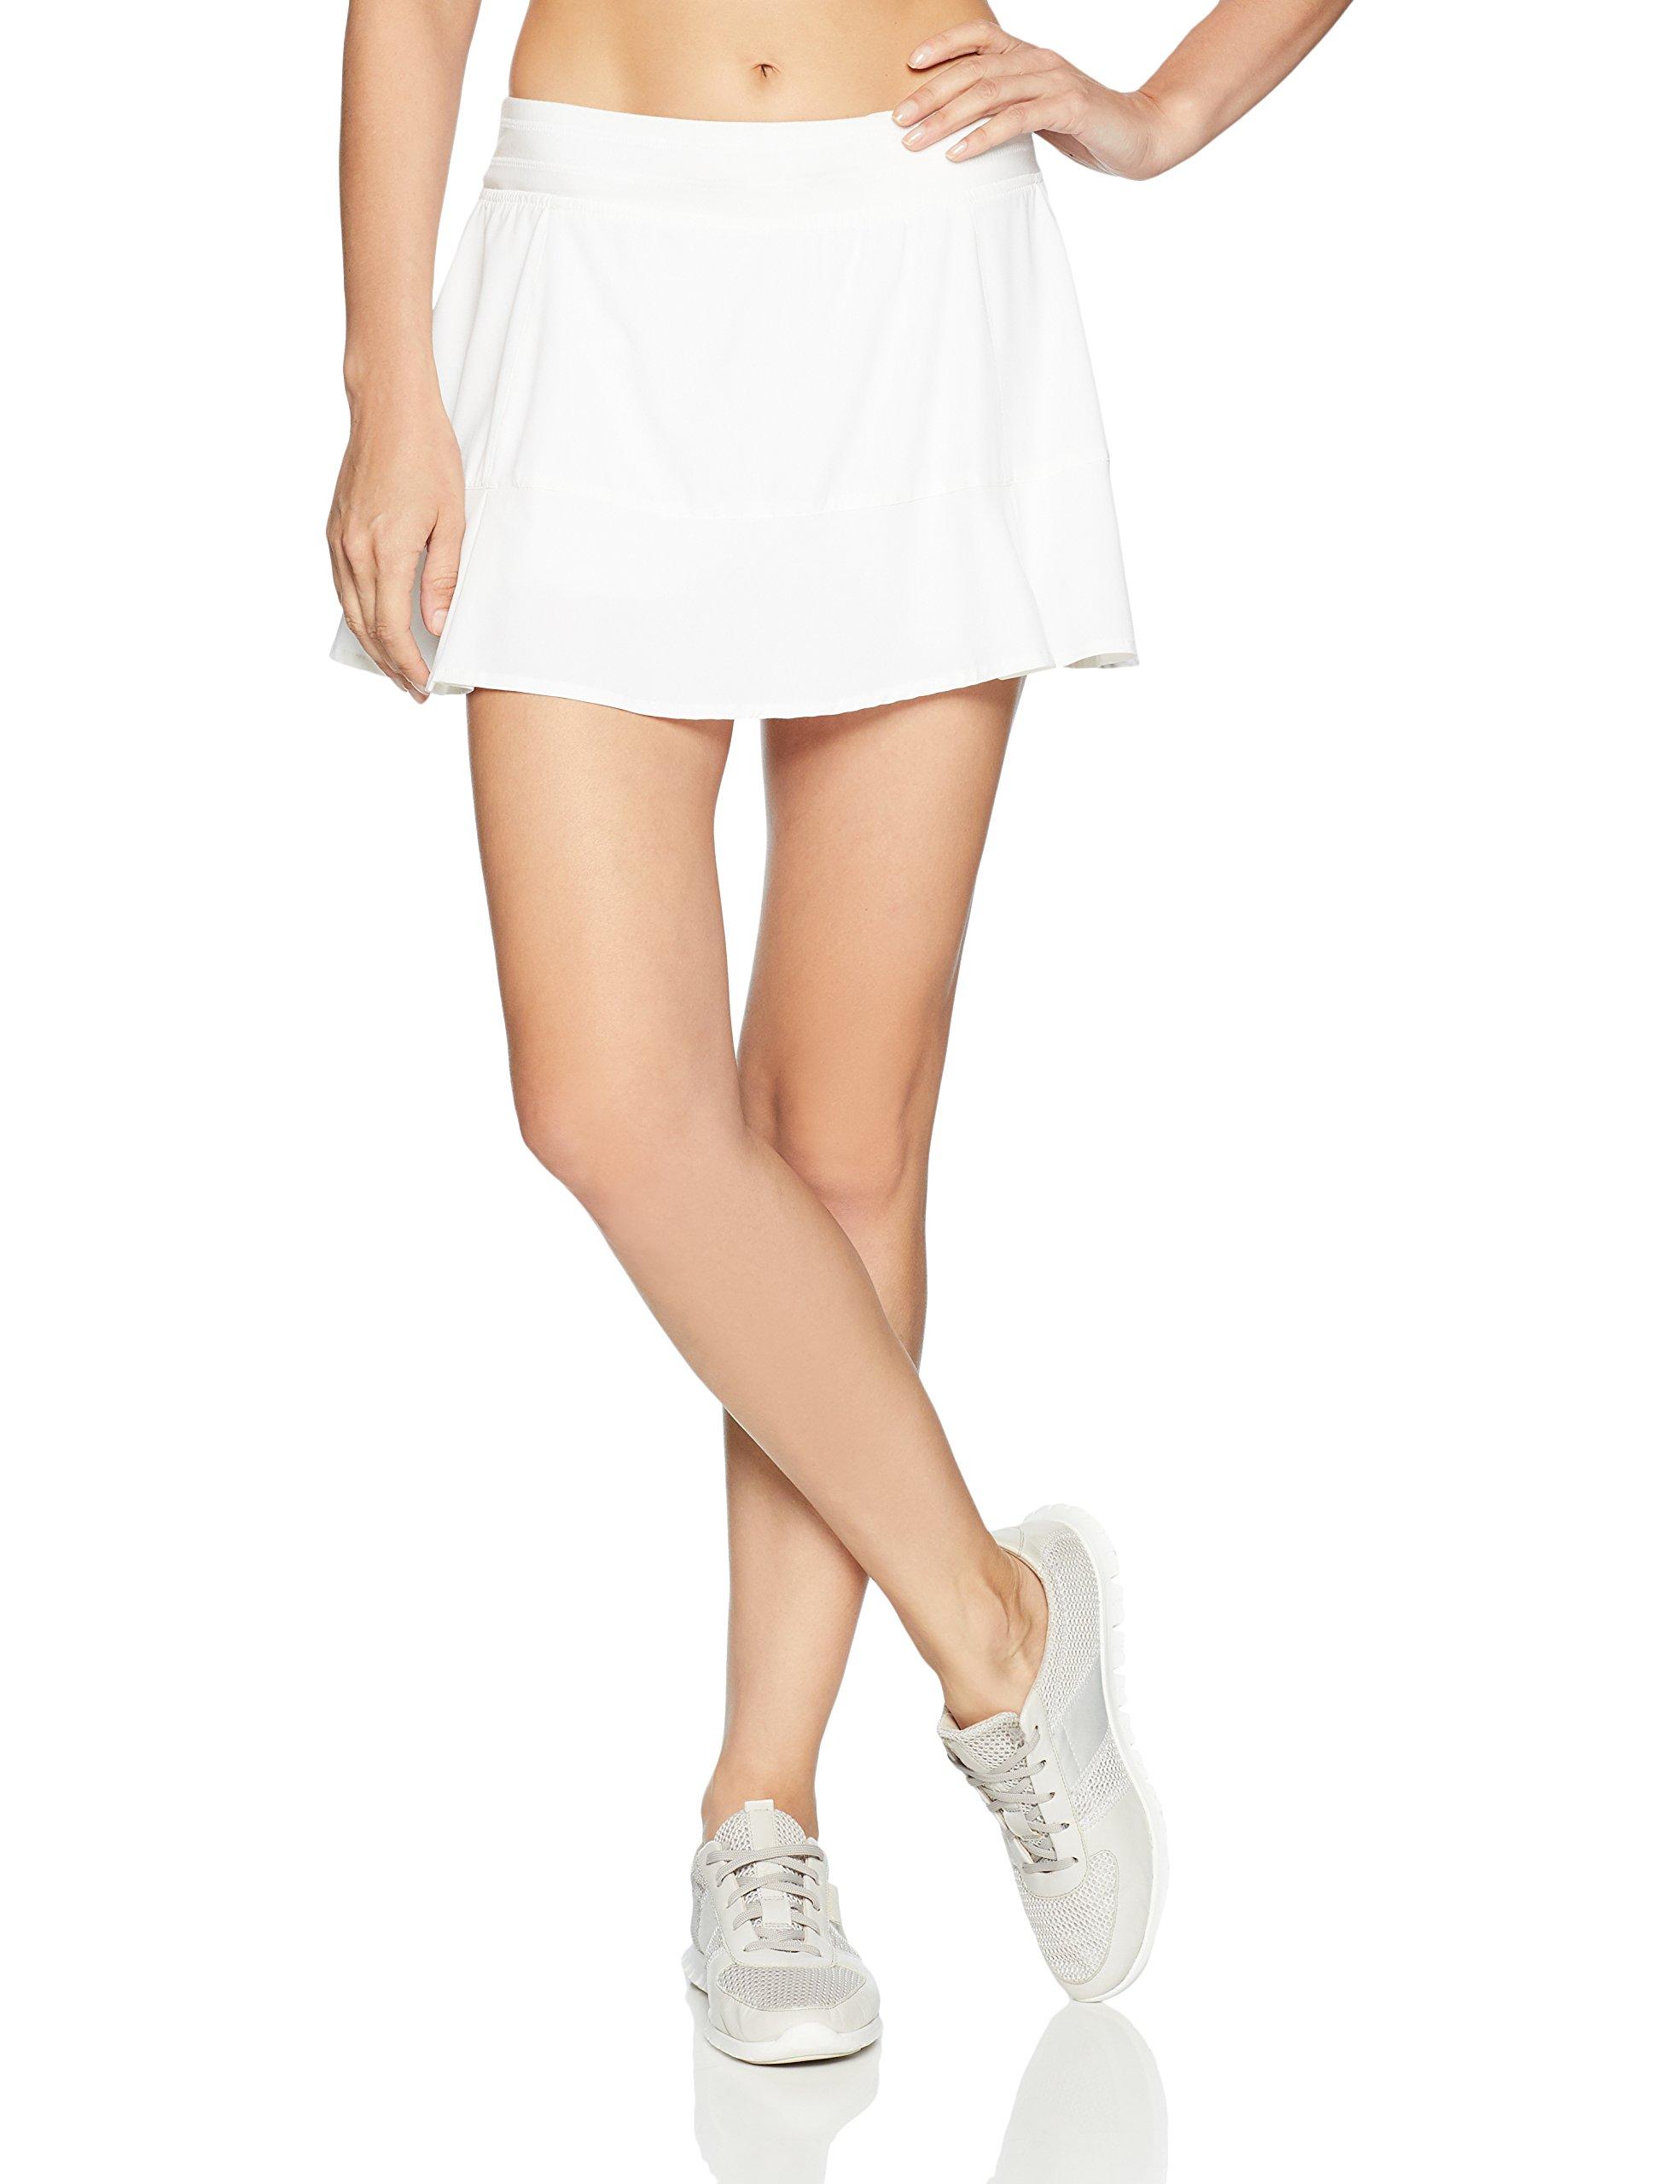 tasc Performance Rhythm Skirt, White, Small by tasc Performance